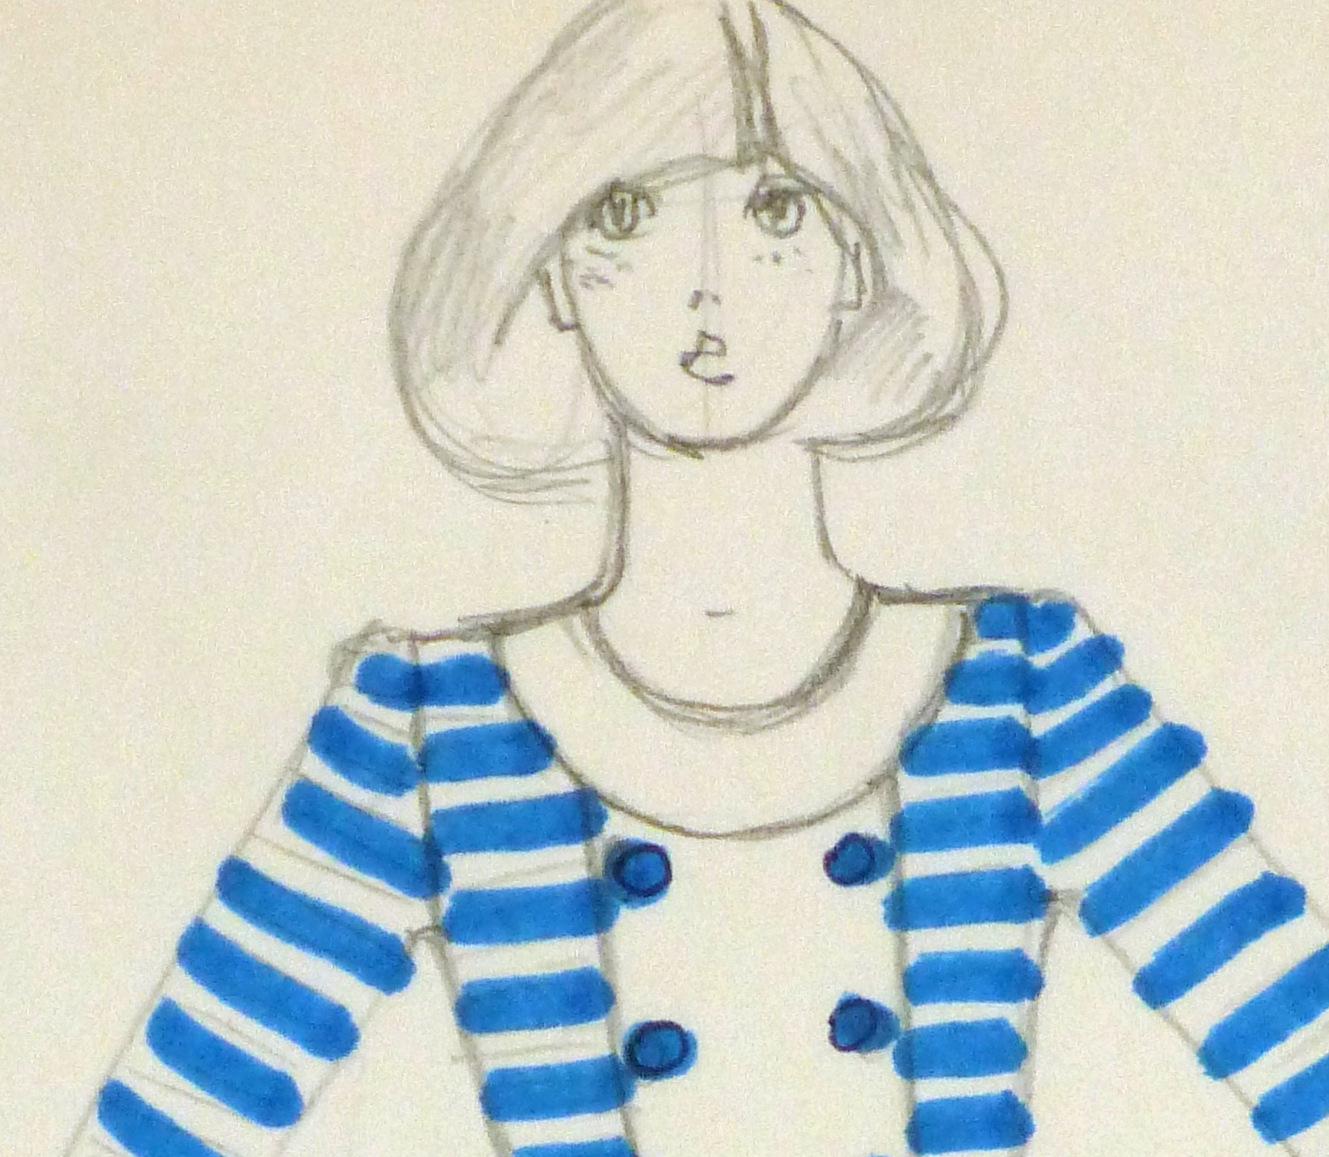 Ink & pencil Fashion Sketch - Blue Button - detail -10109M